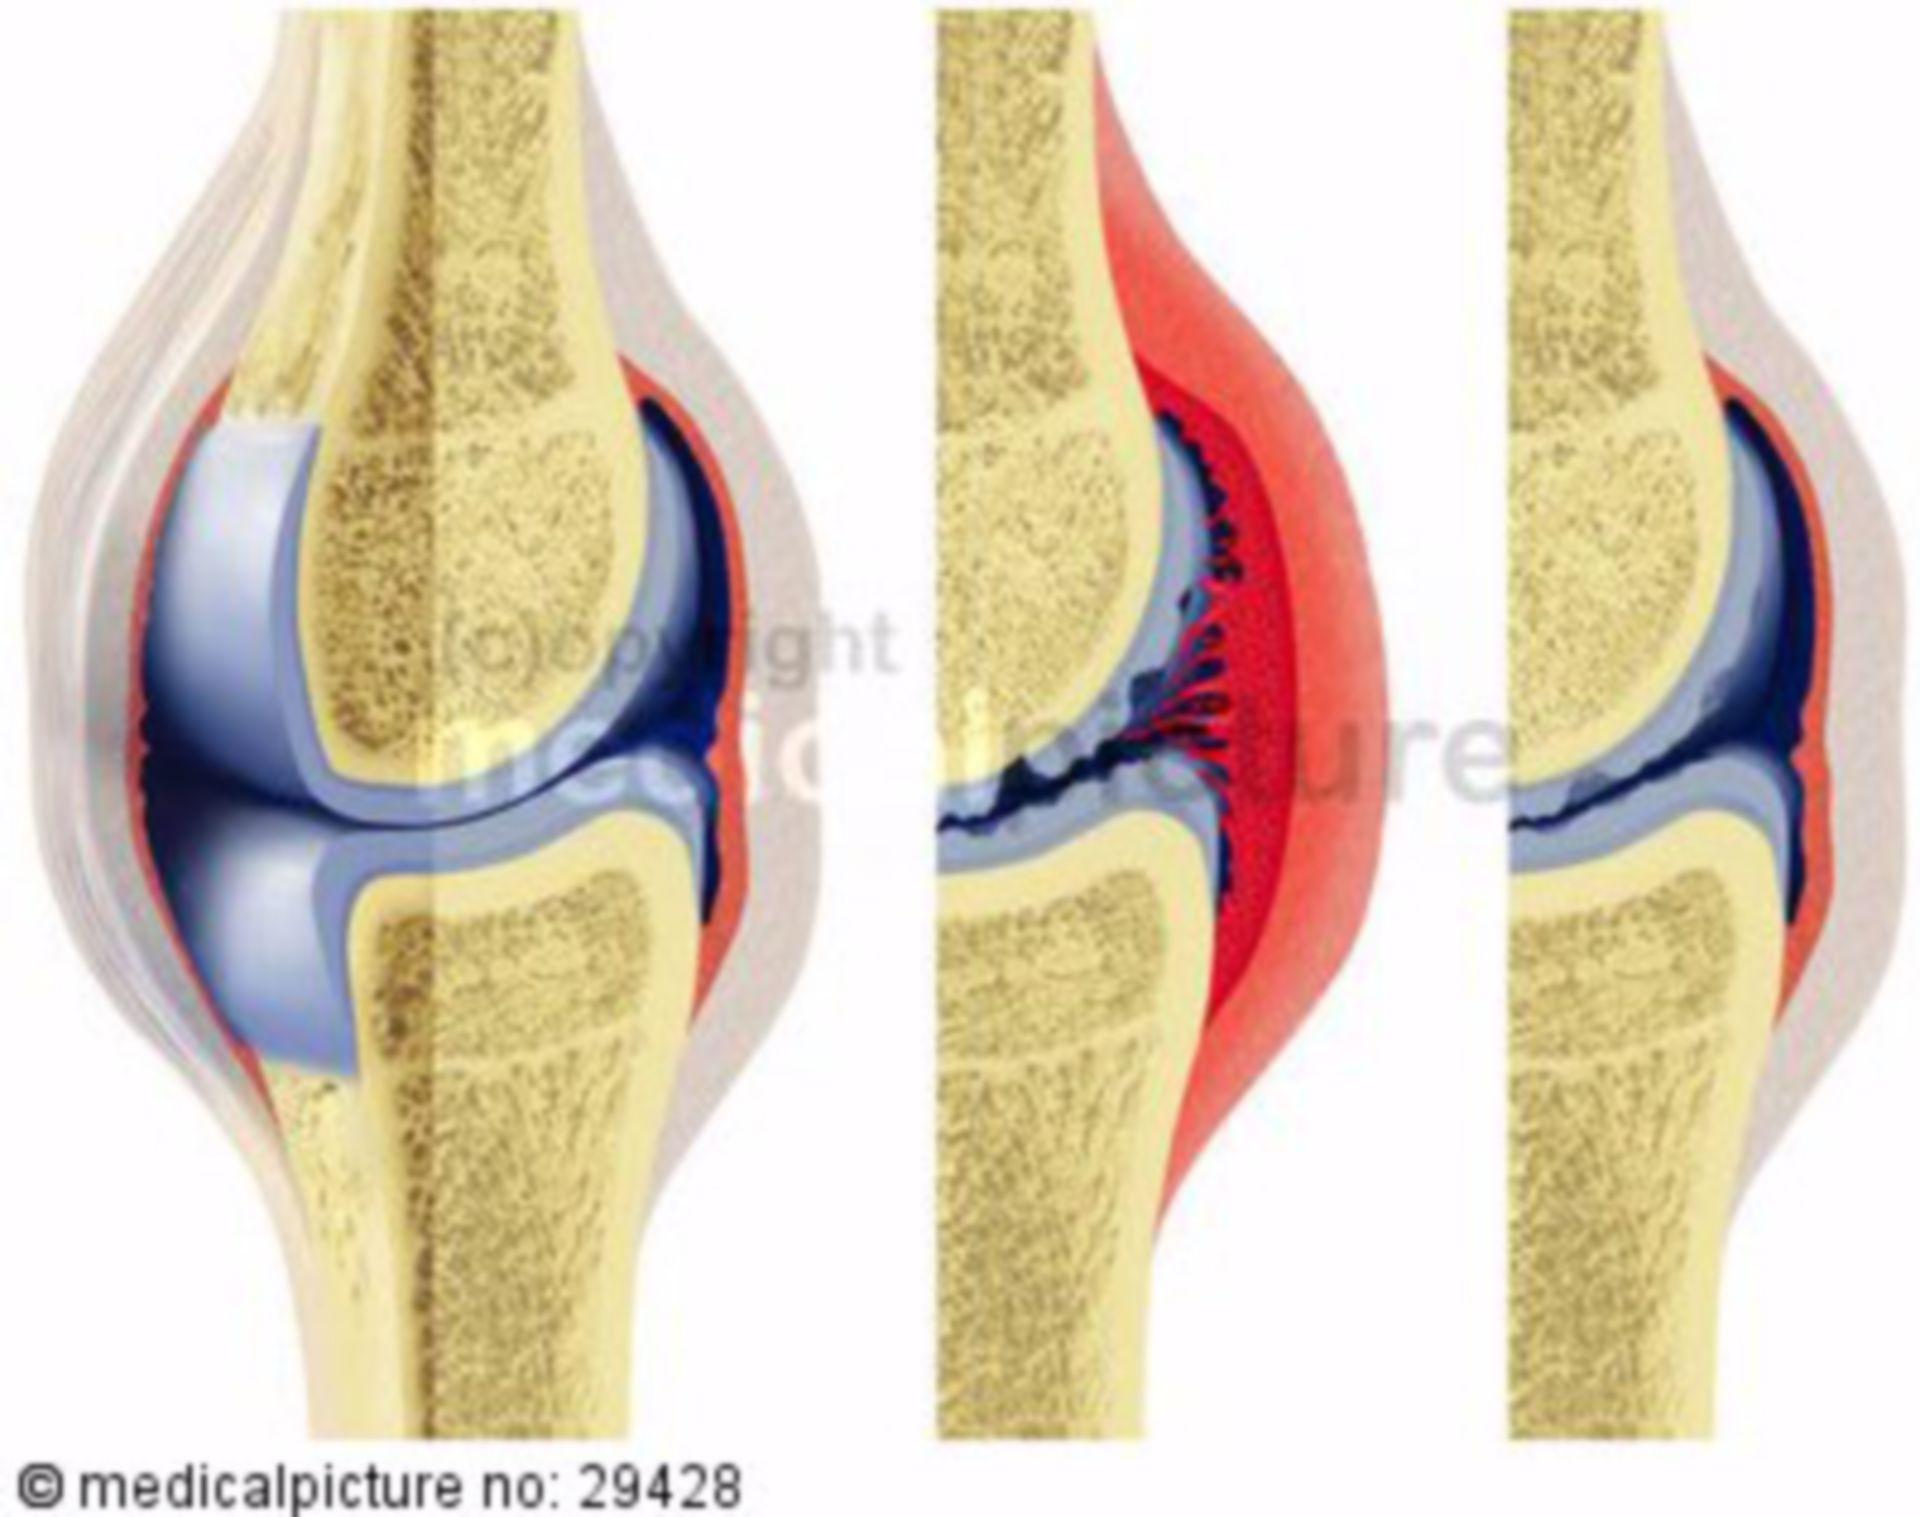 Development and progress of (treated) rheumatoid arthritis